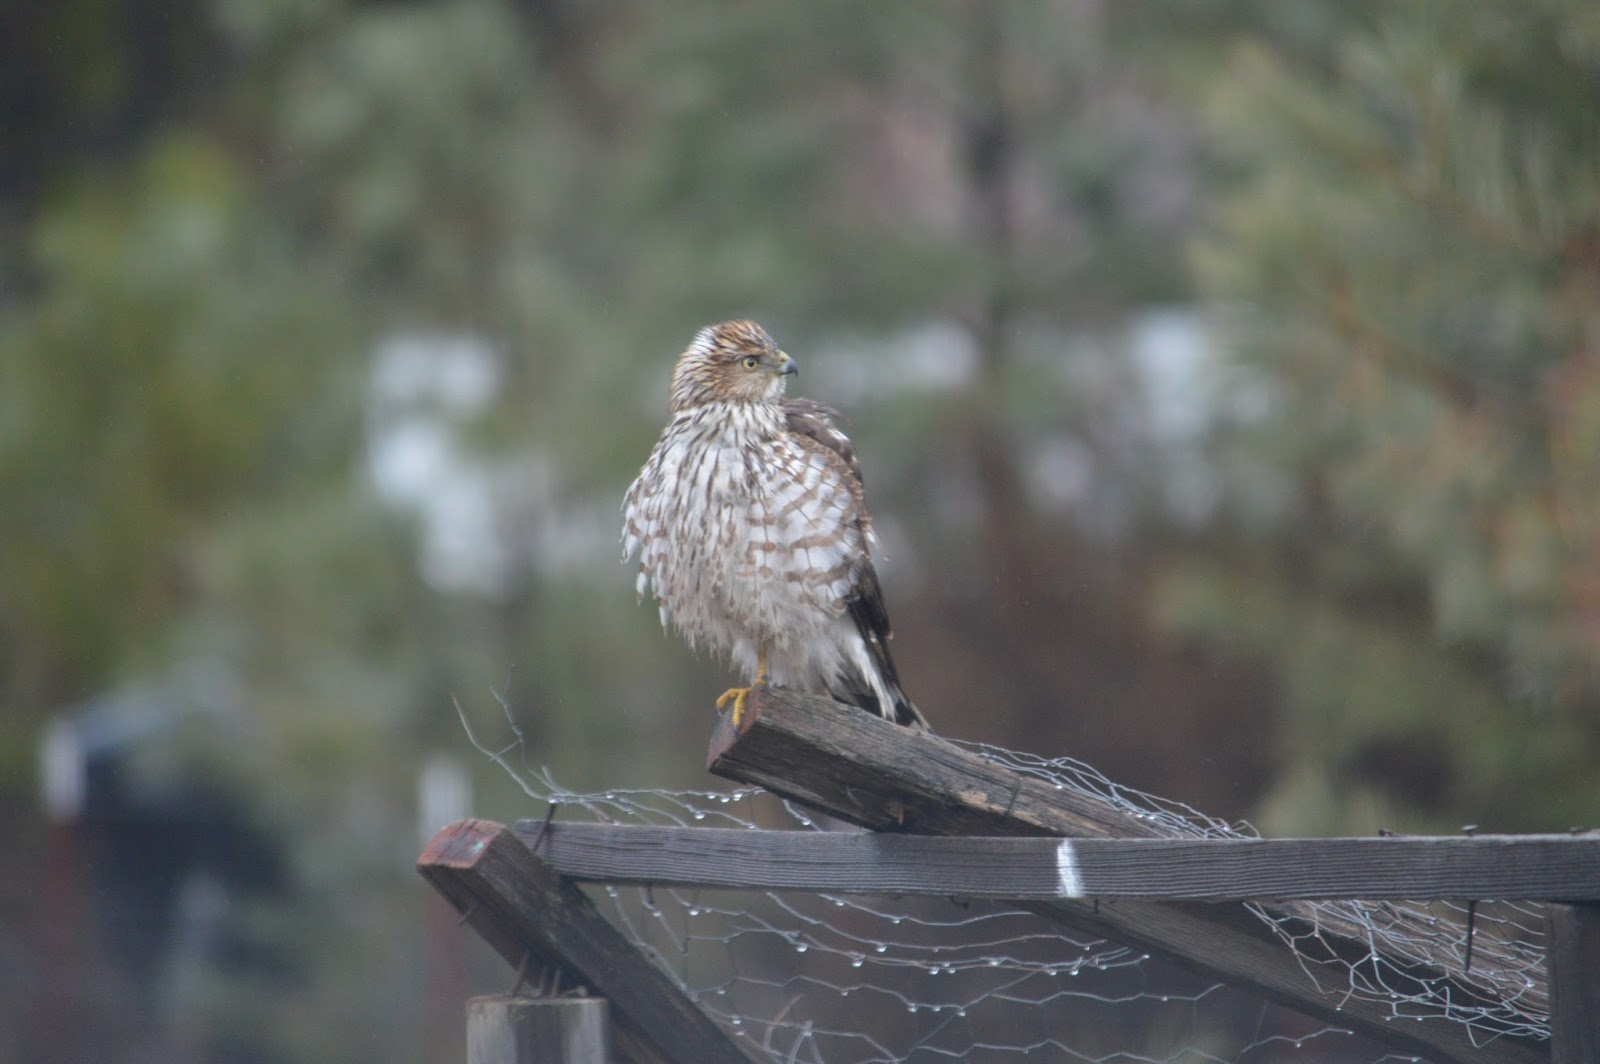 basking in the light the hawk in my backyard